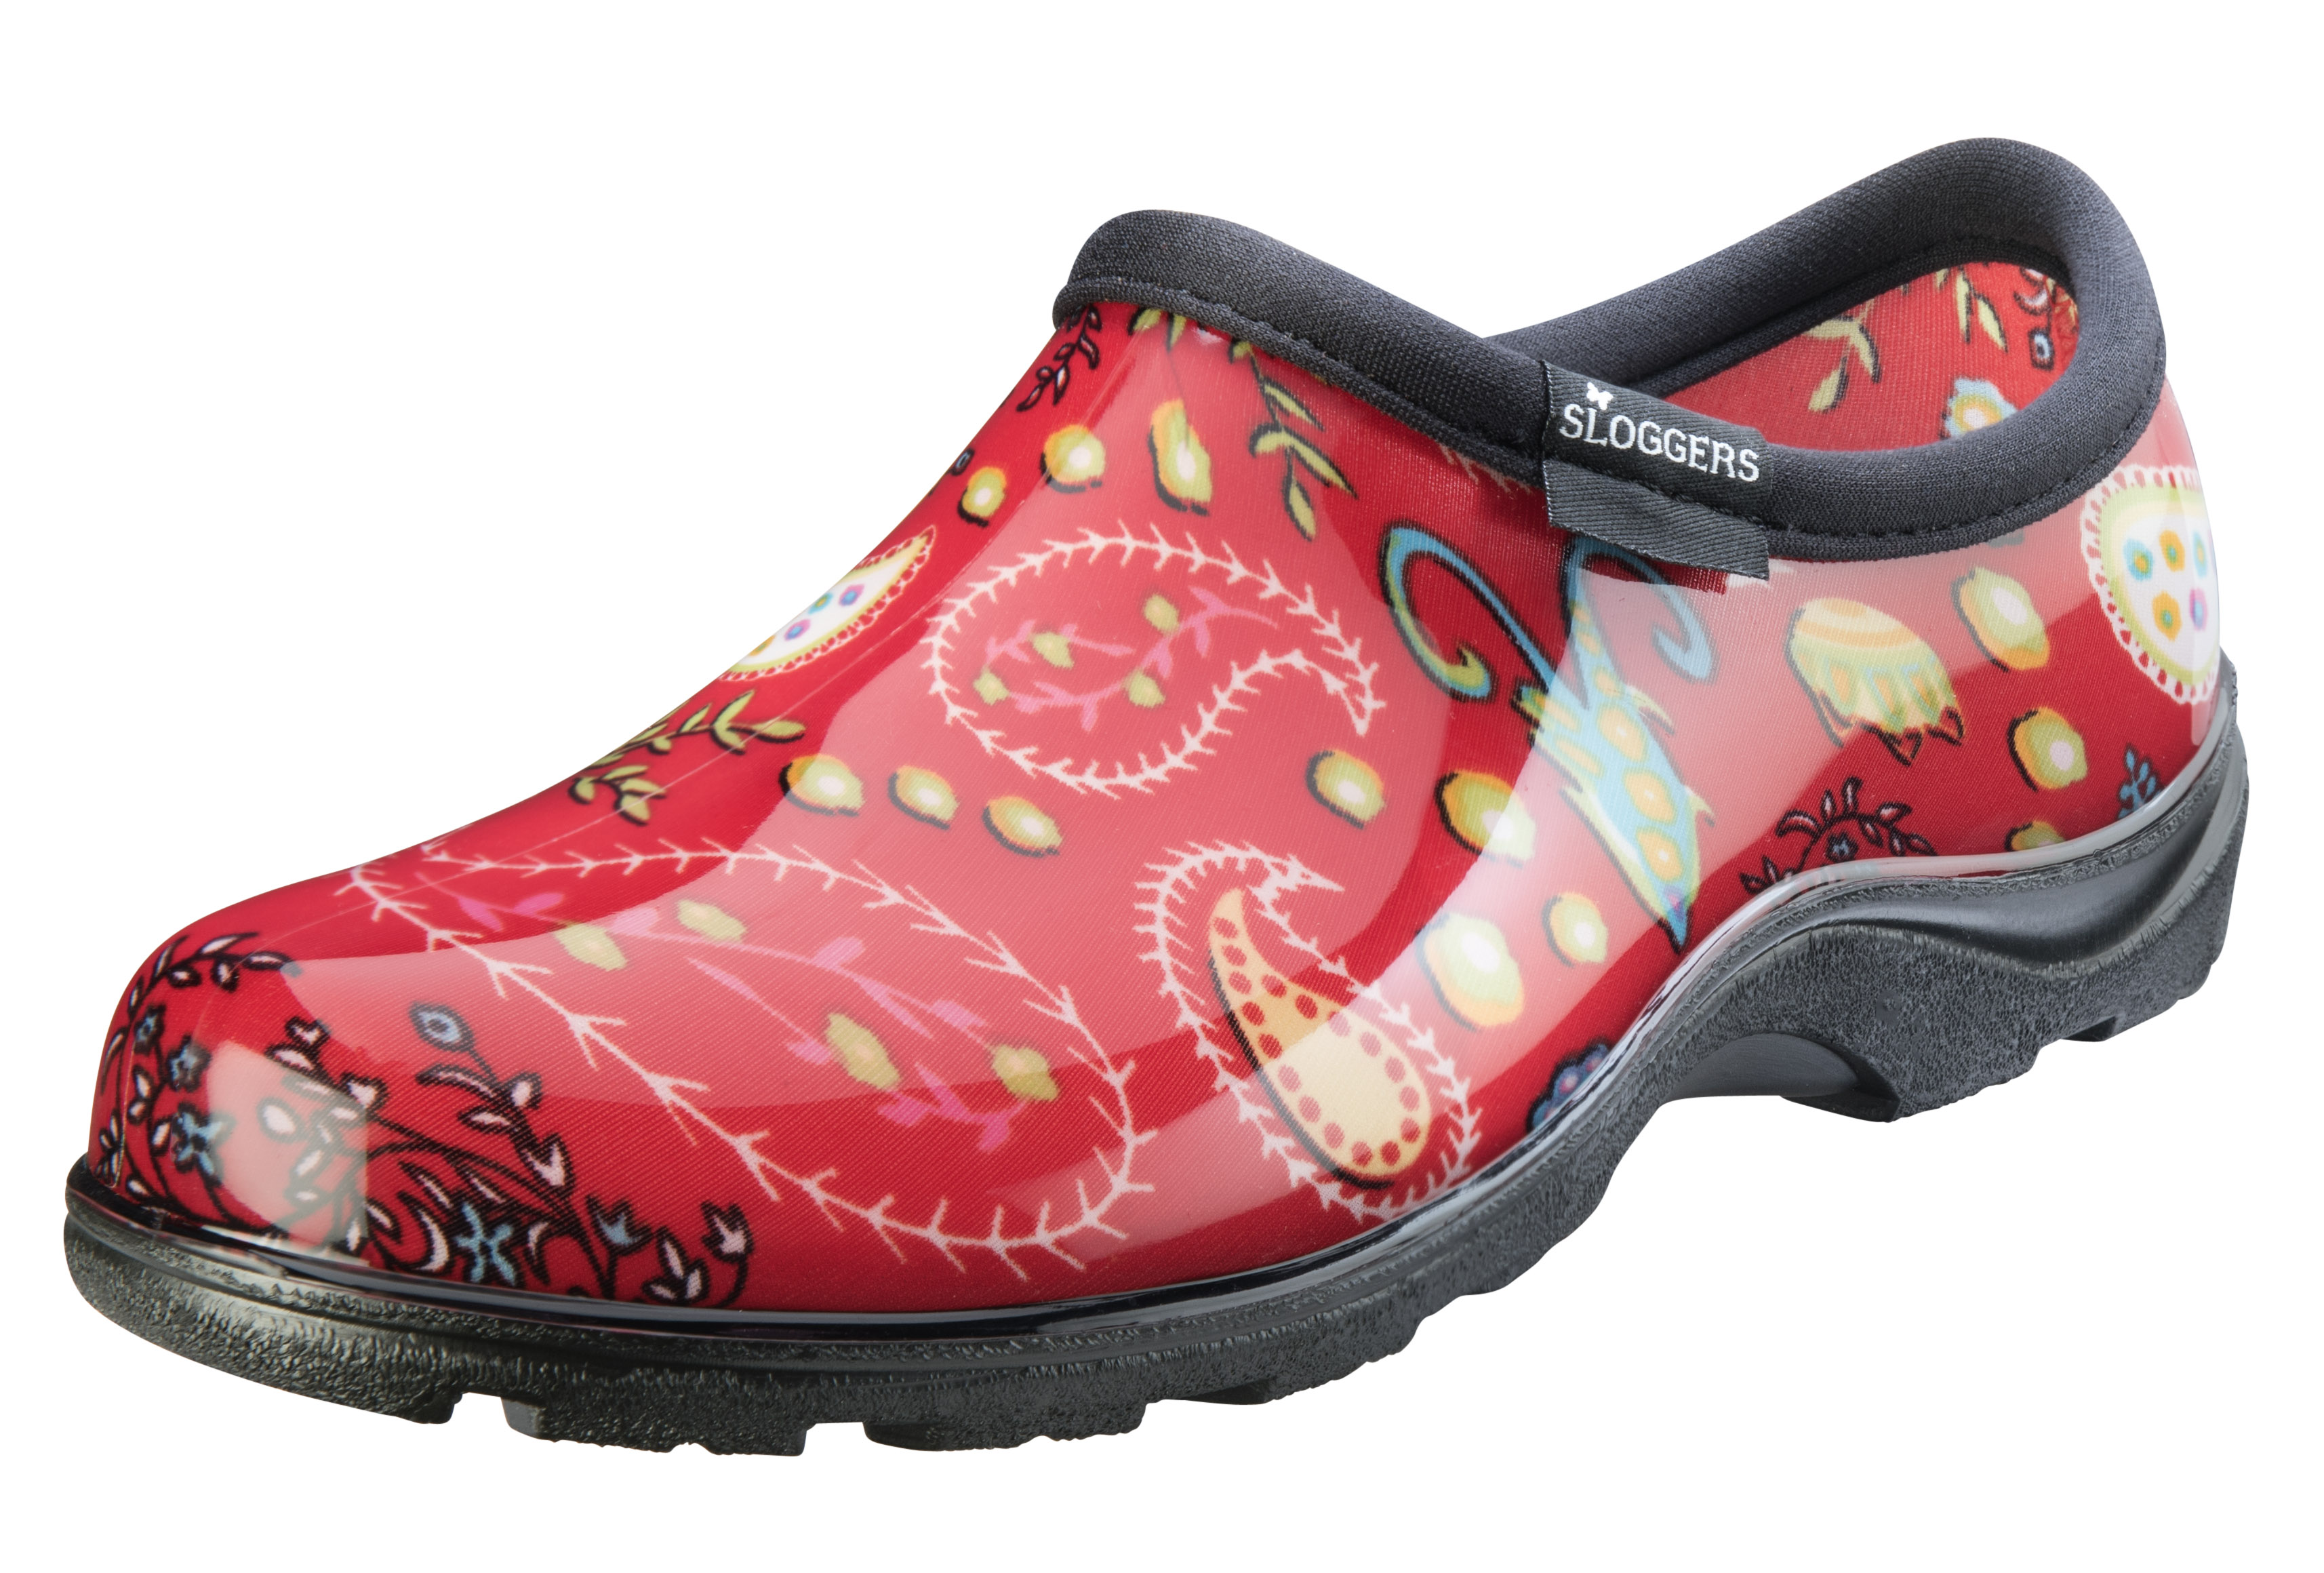 93d67ed662d649 Sloggers - Sloggers Women's Sloggers Waterproof Rain Shoes - Walmart.com